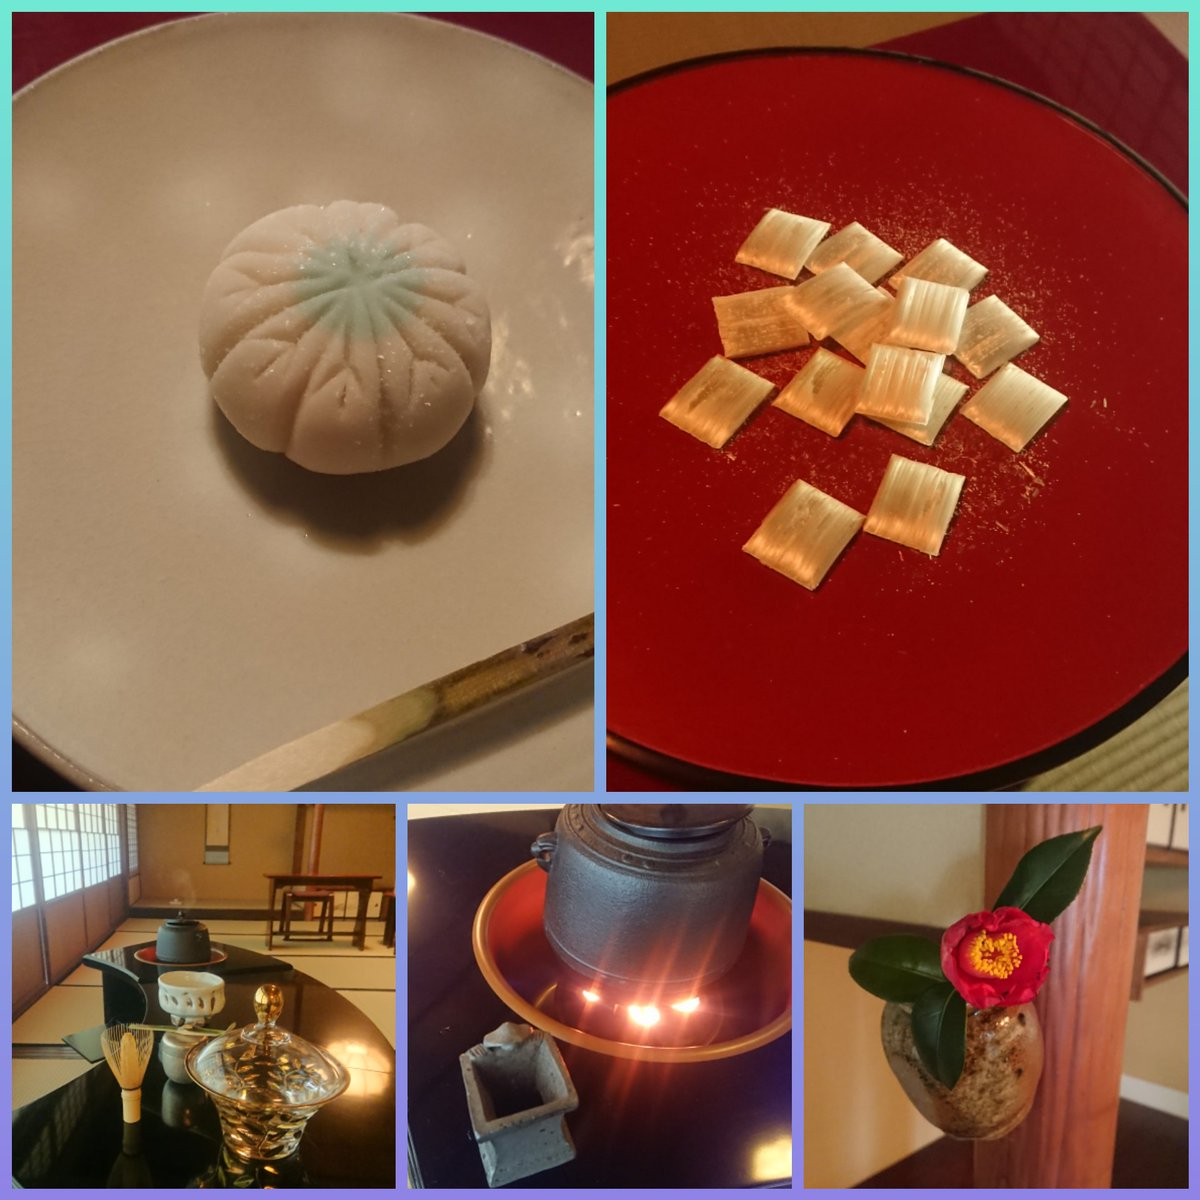 test ツイッターメディア - 卒業茶会2019③ お点前は即中斎好みの末広棚。 お菓子は美濃忠製 下萌え。 干菓子は九重本舗玉澤 霜ばしら。 替茶碗に小野穣作 猪目。 雪だるまをイメージした手あぶりも好評でした。 #中京大学 #茶道部 #春から中京 https://t.co/OfhSnMkXJ4